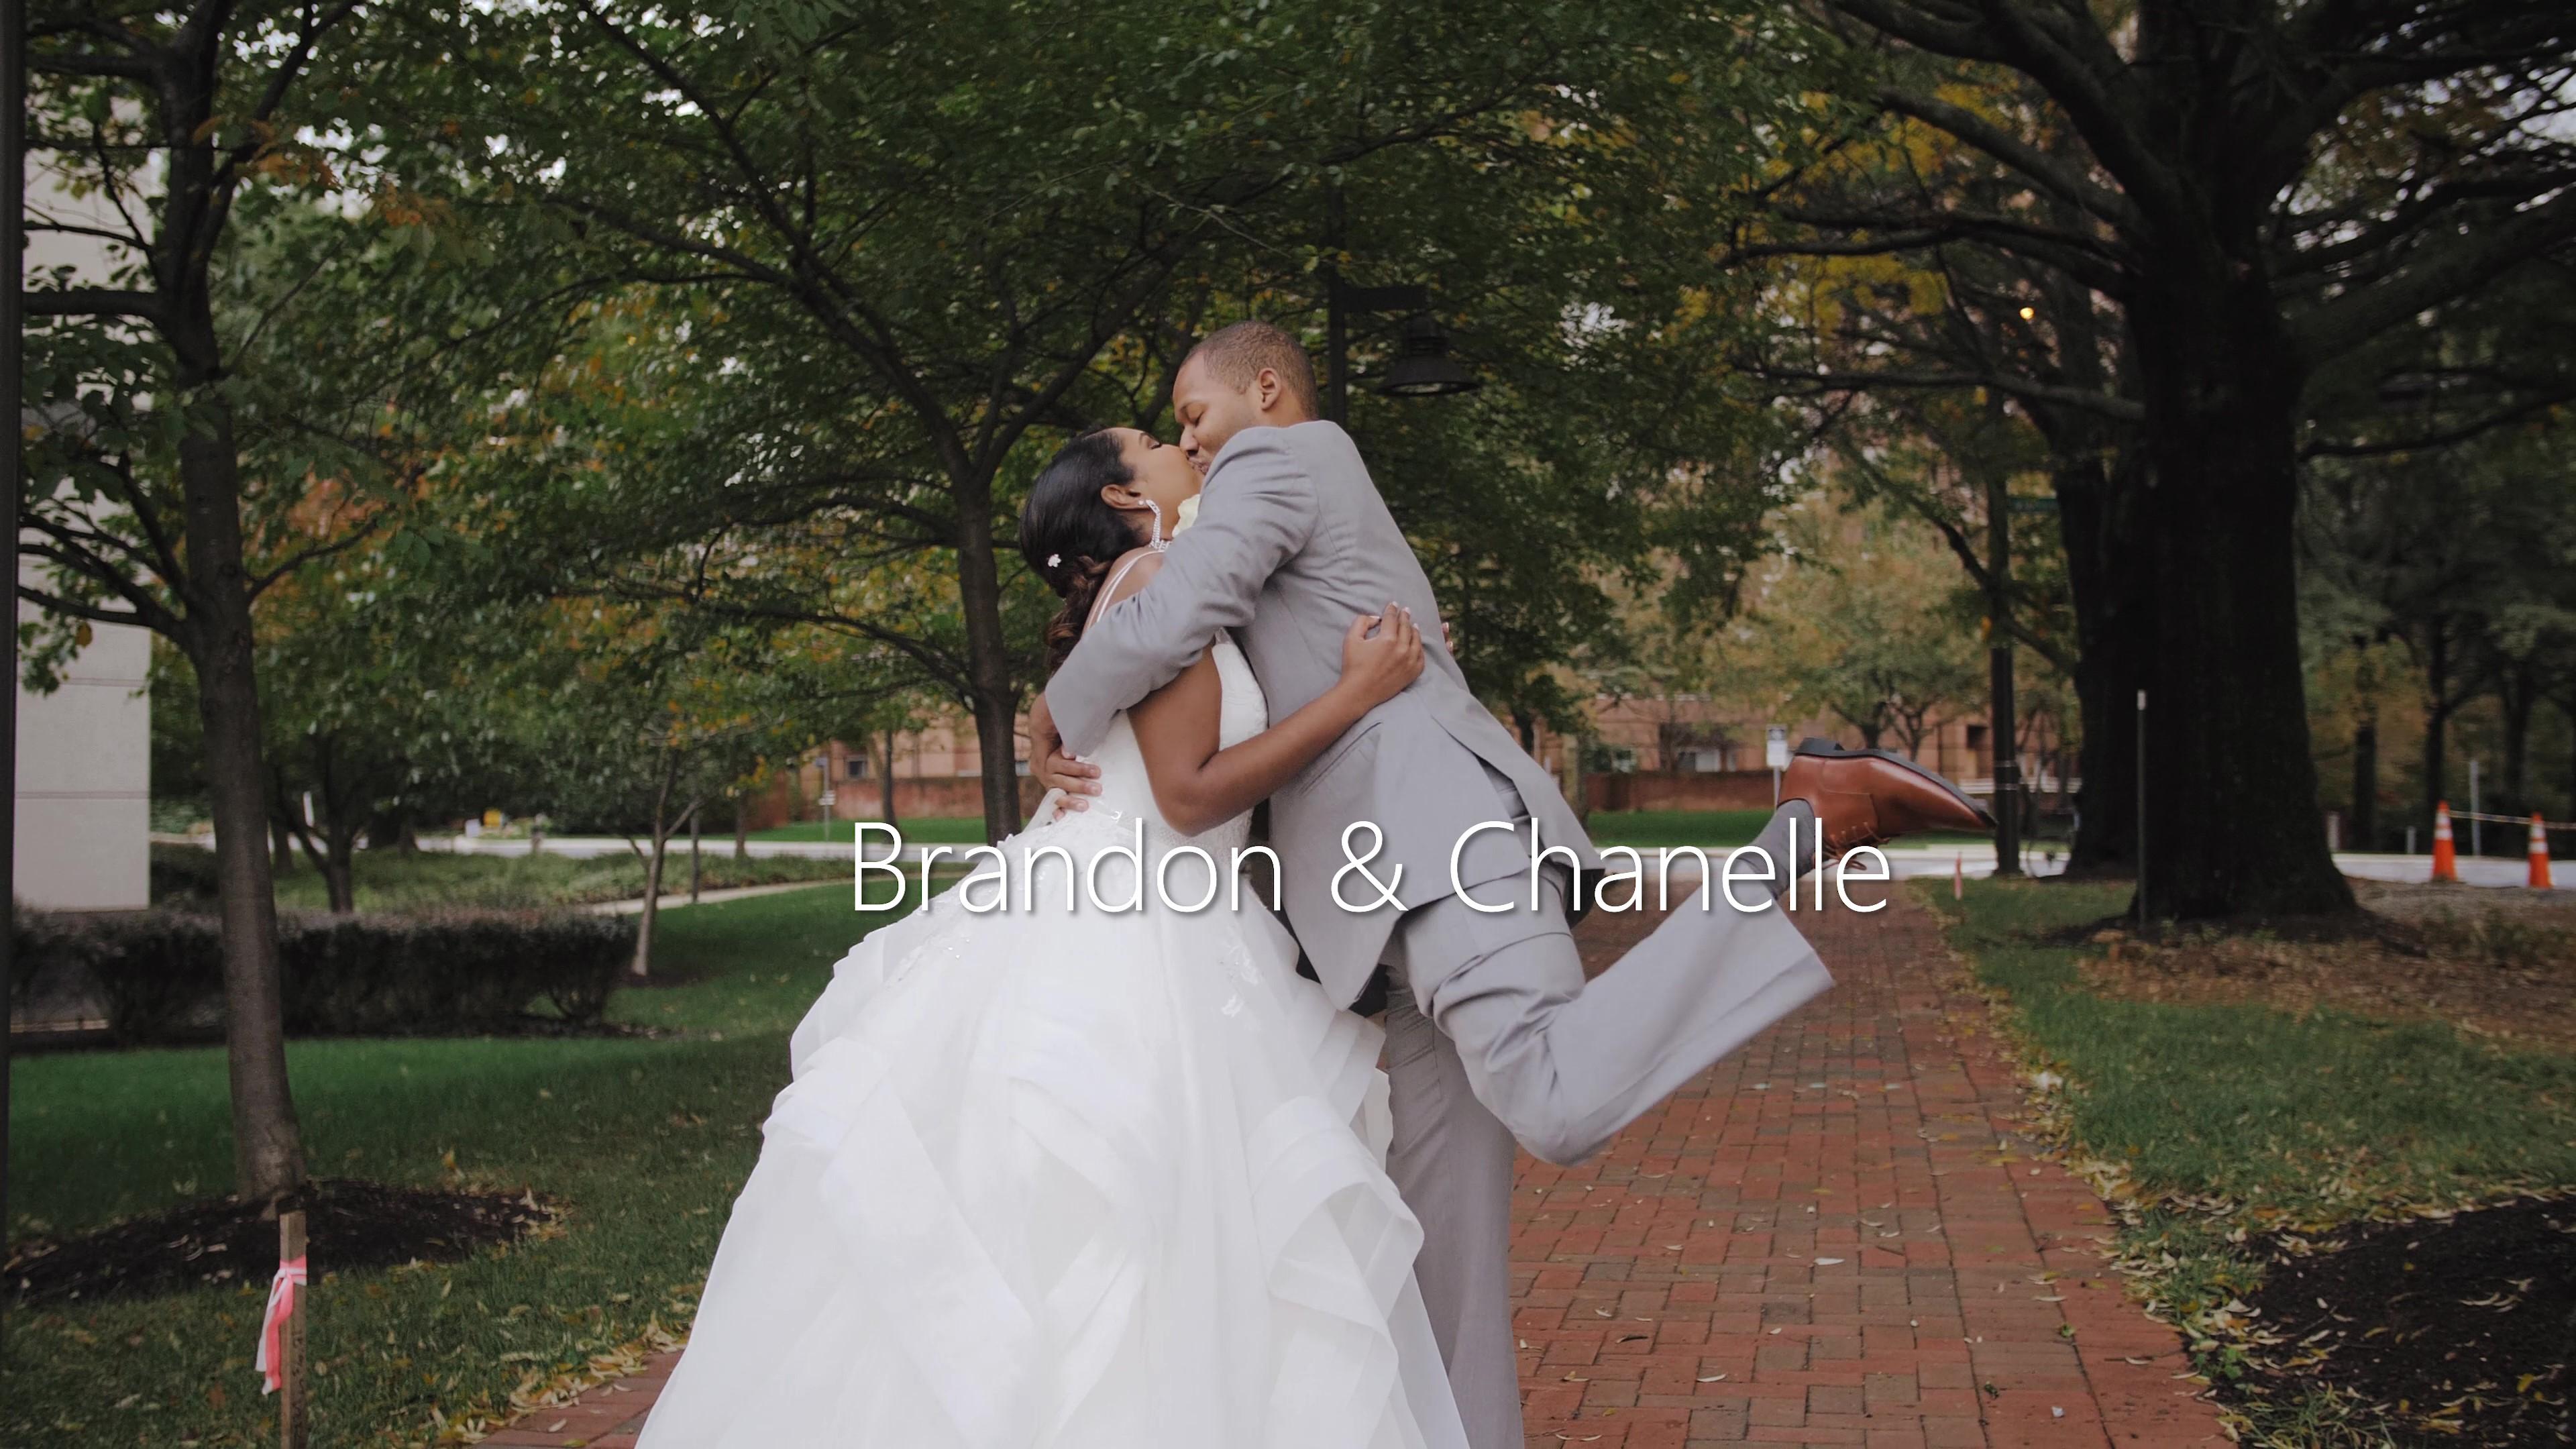 Brandon + Chanelle | Bethesda, Maryland | The Marriott